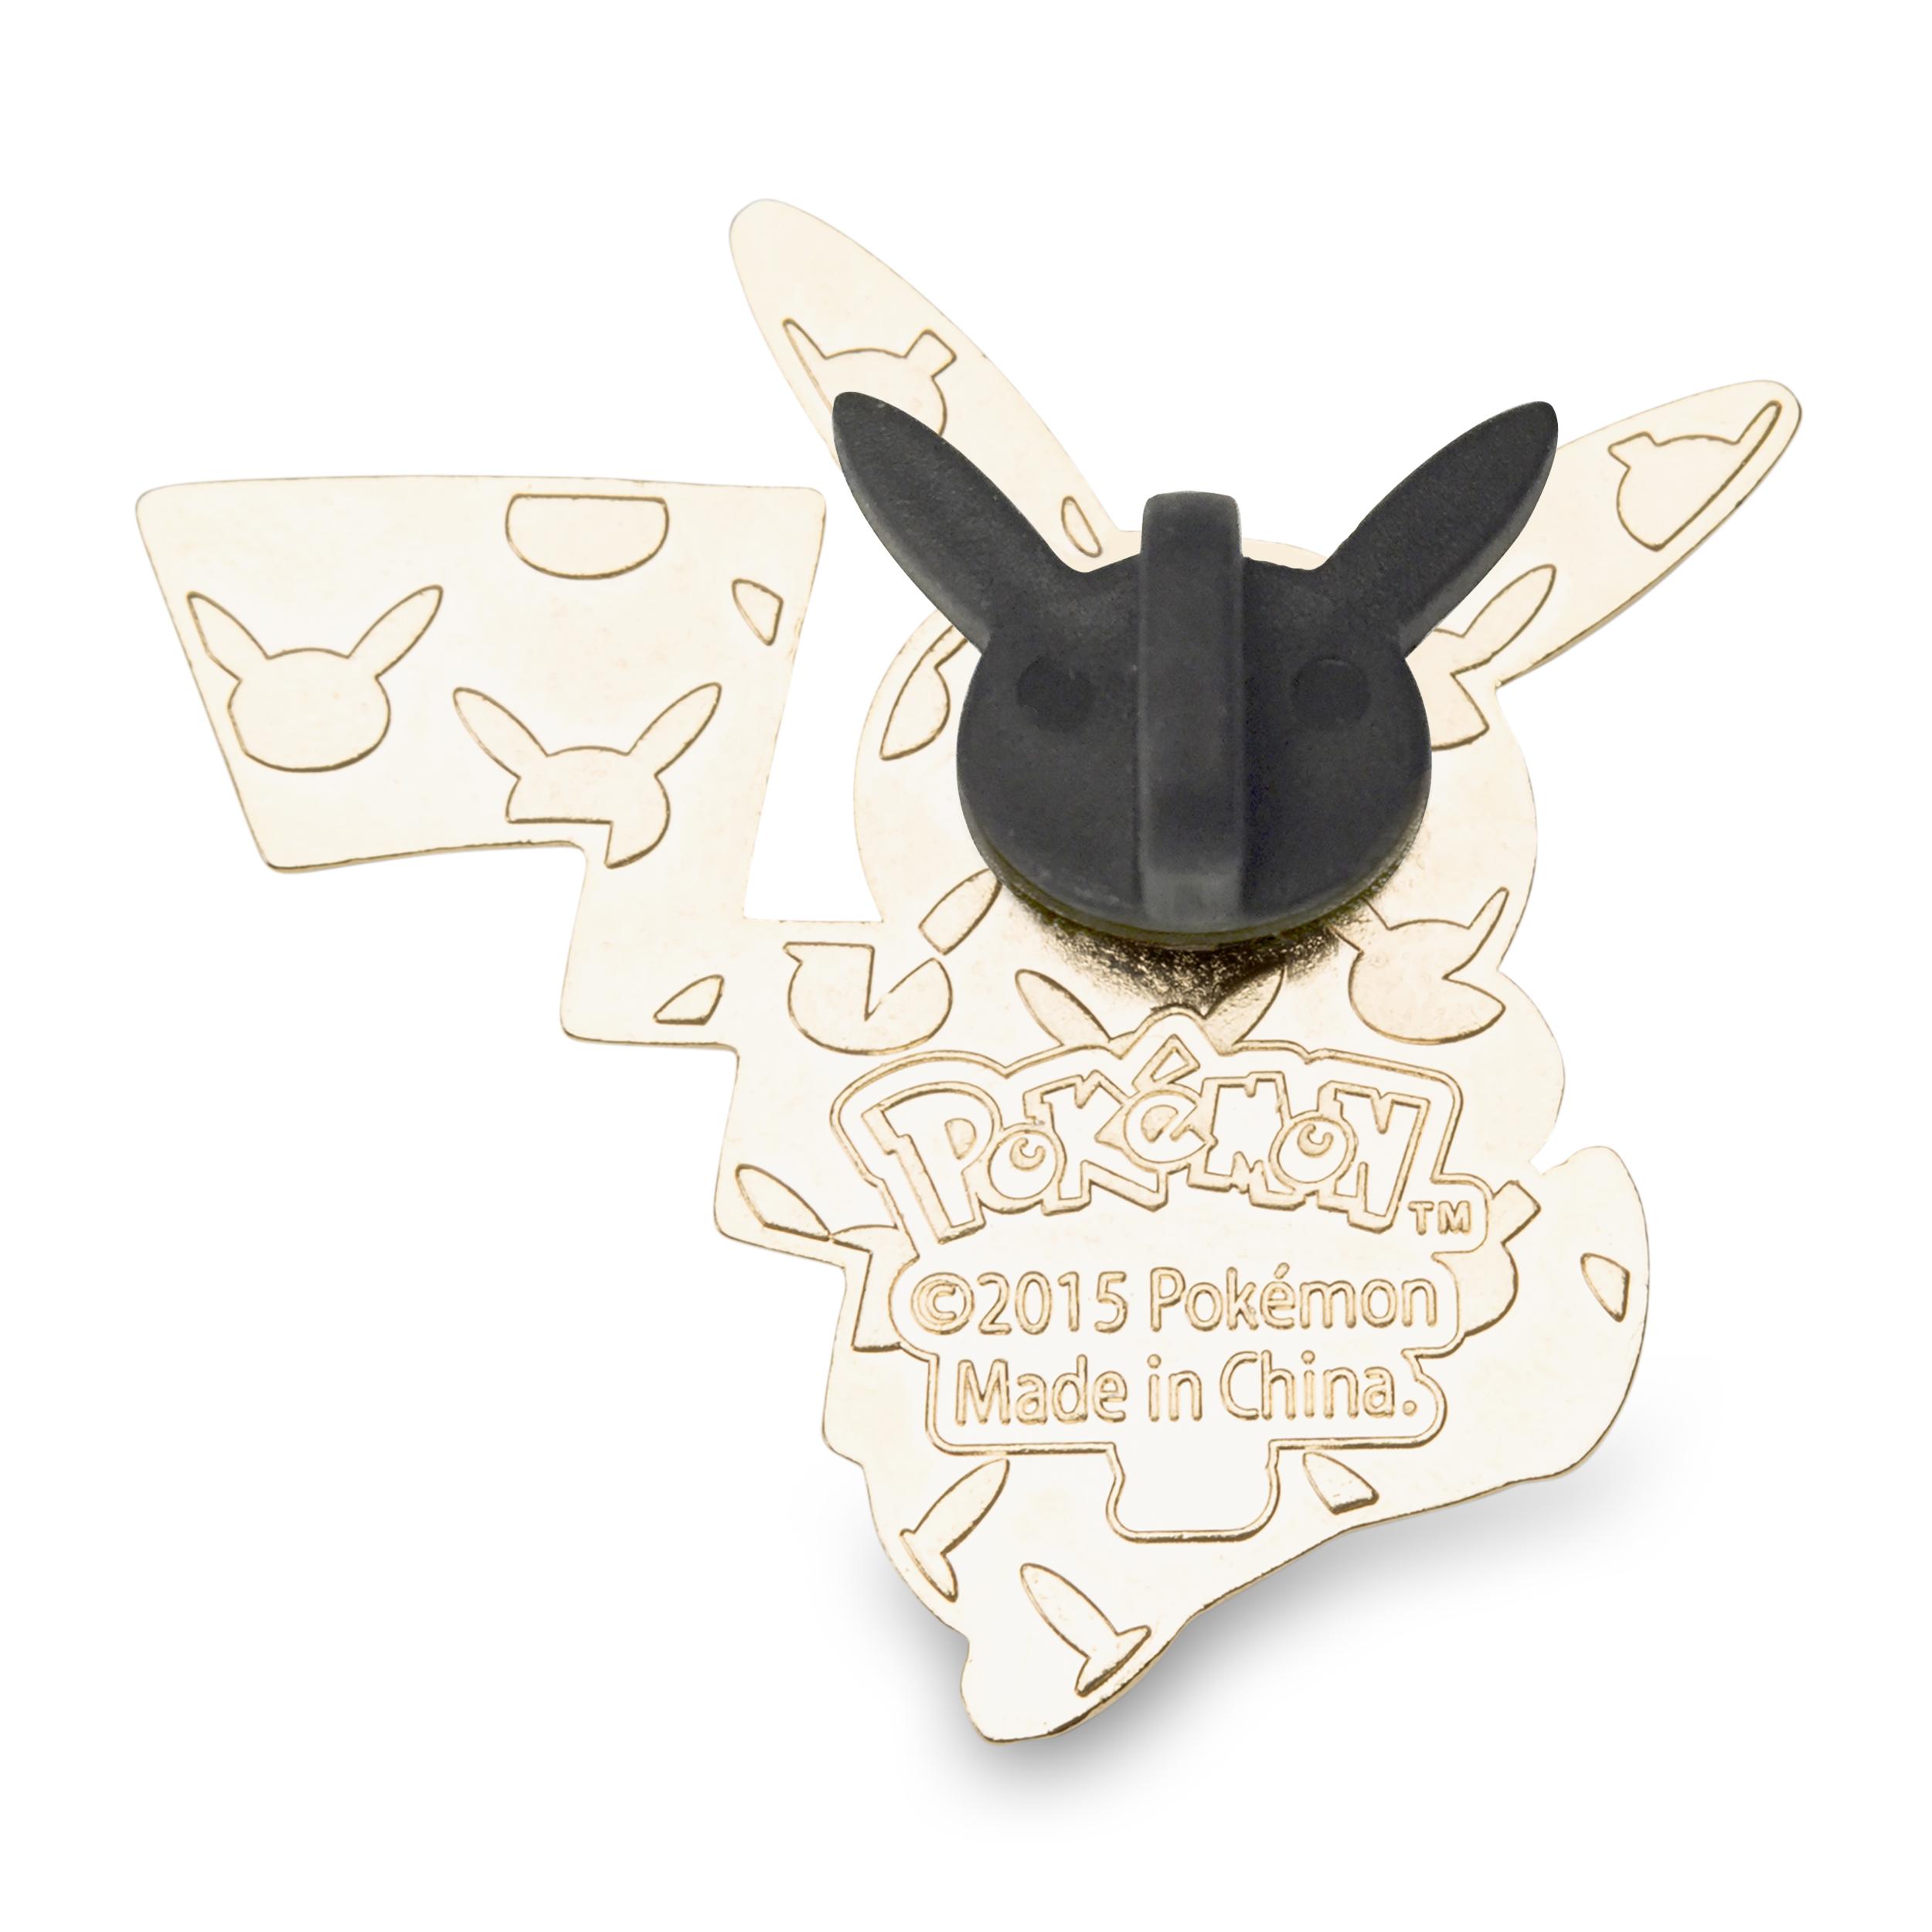 Pikachu Bulbasaur Charmander Squirtle Pokémon Pins (4 Pack)